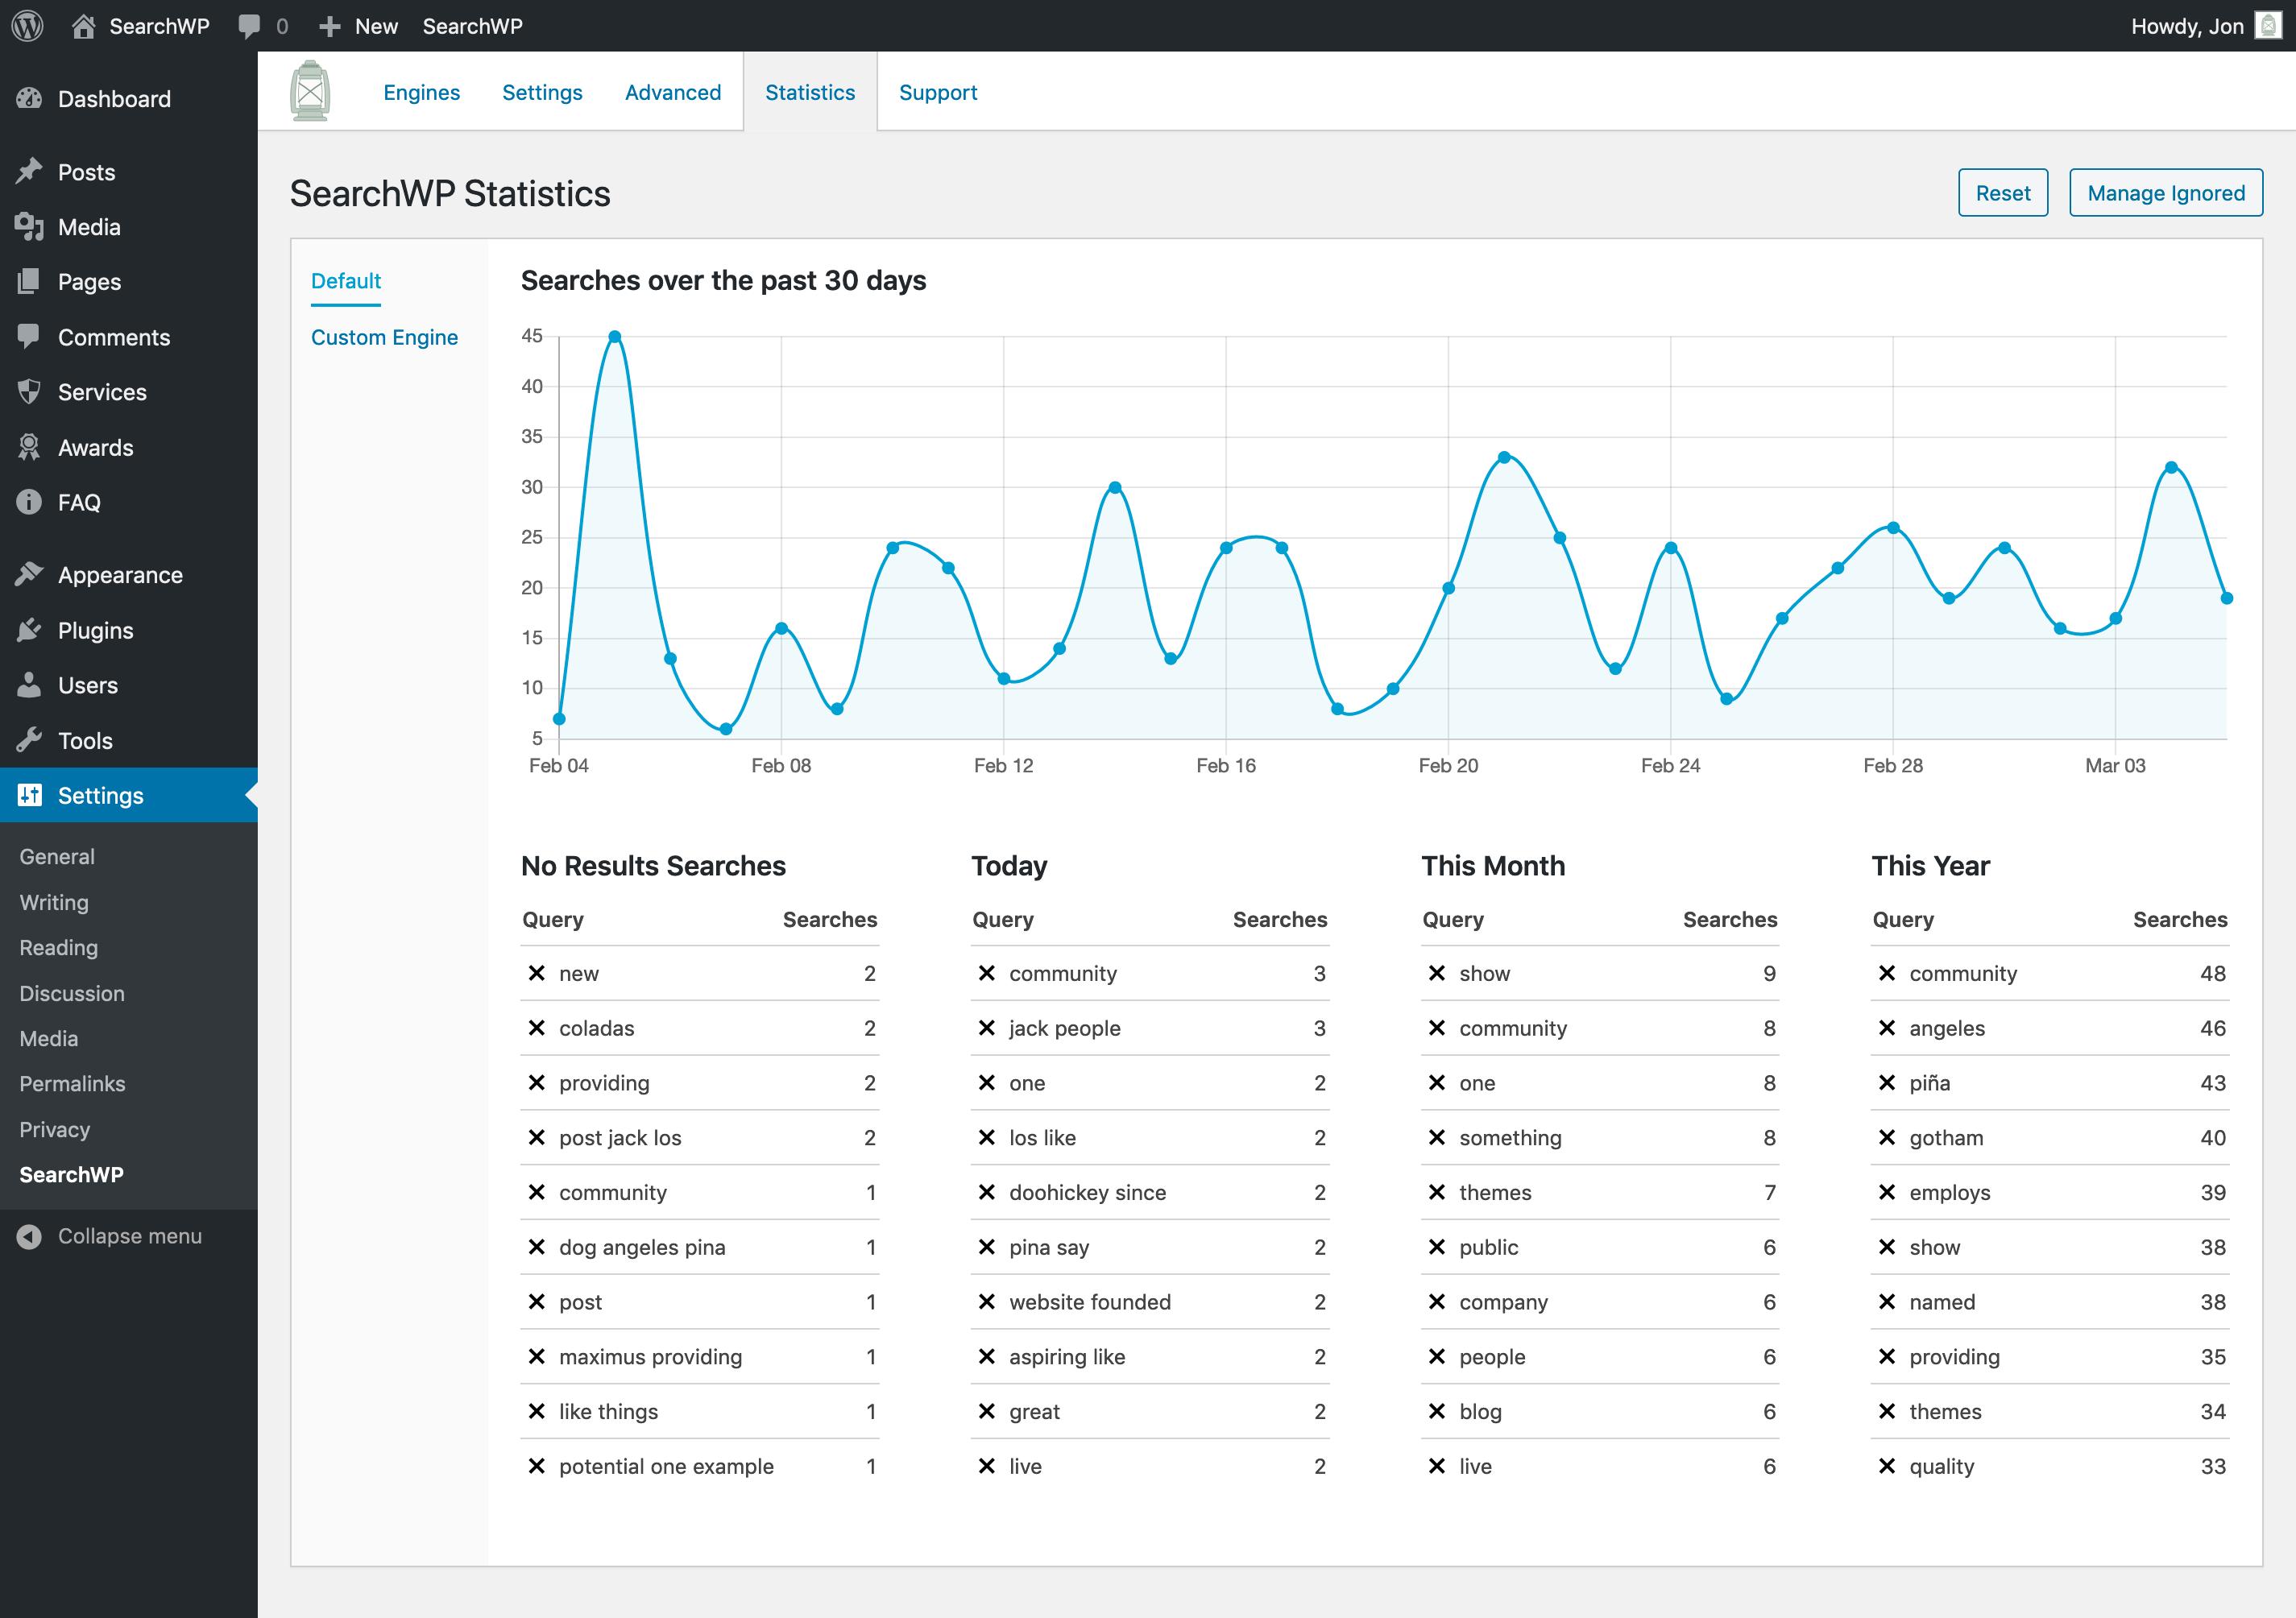 Screenshot of SearchWP's Statistics